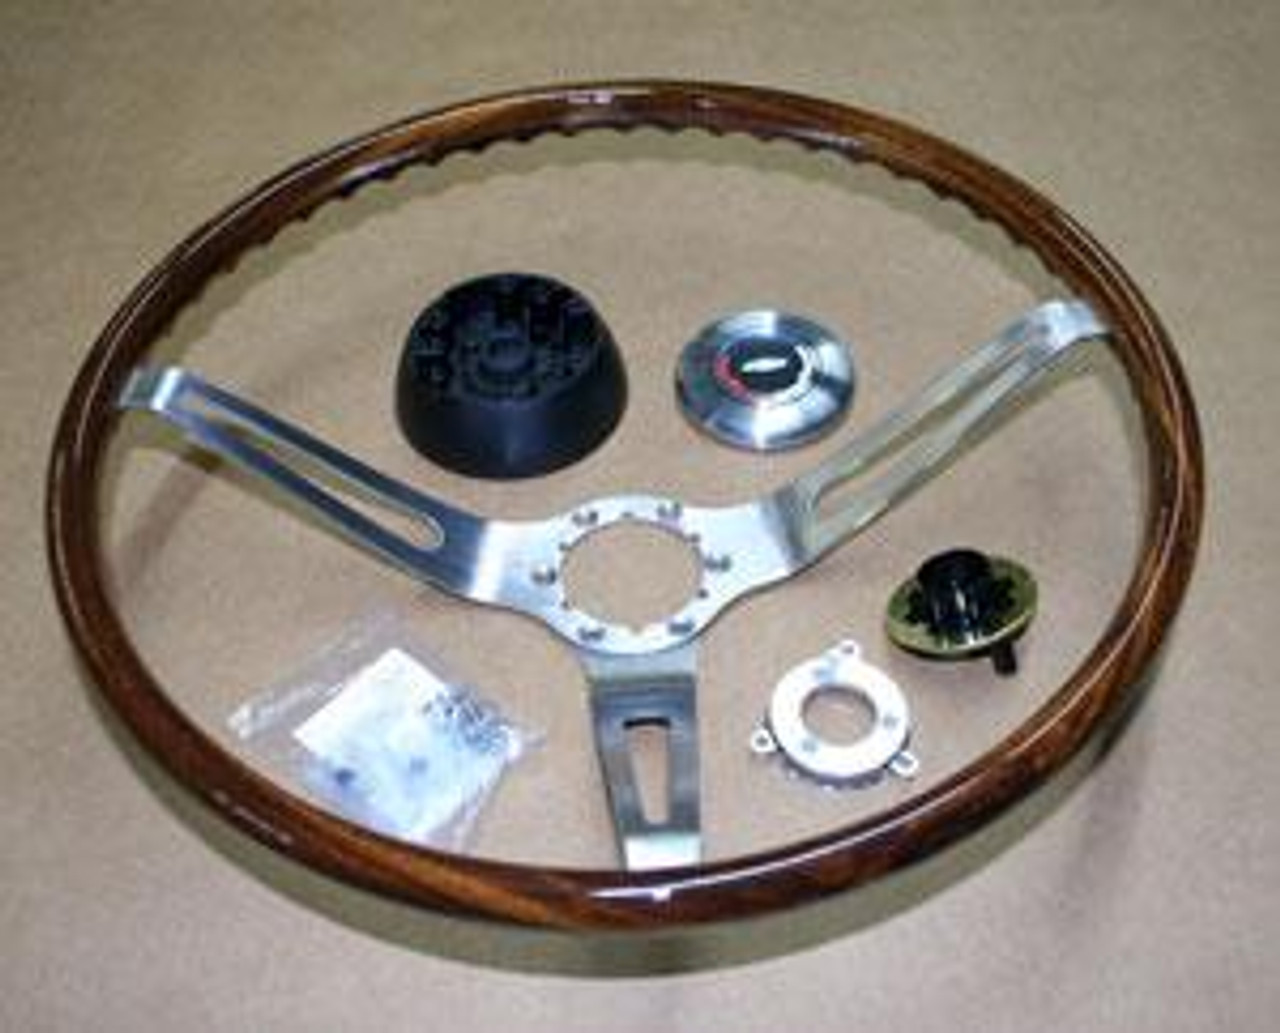 1967-68 Walnut Steering Wheel (Complete)